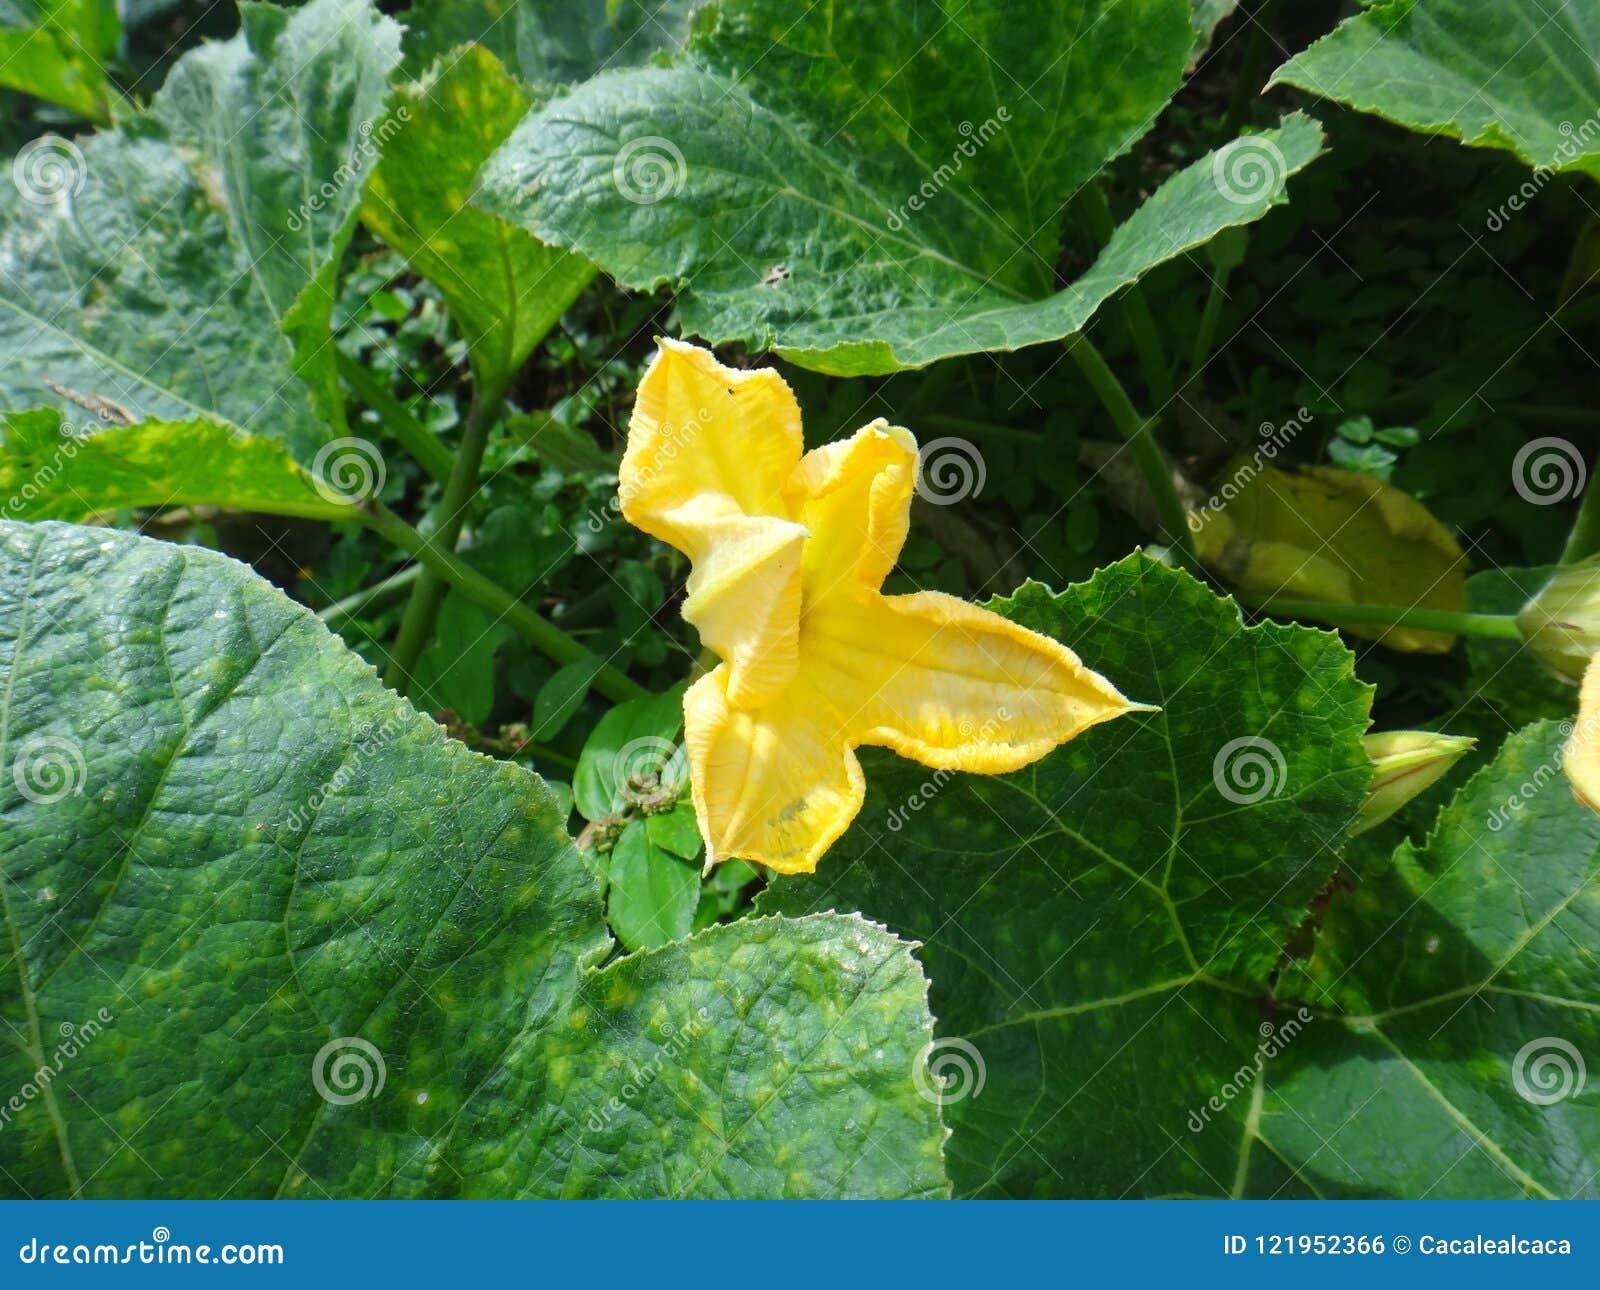 Marrow green yellow flower stock photo image of cocozelle download marrow green yellow flower stock photo image of cocozelle culture 121952366 mightylinksfo